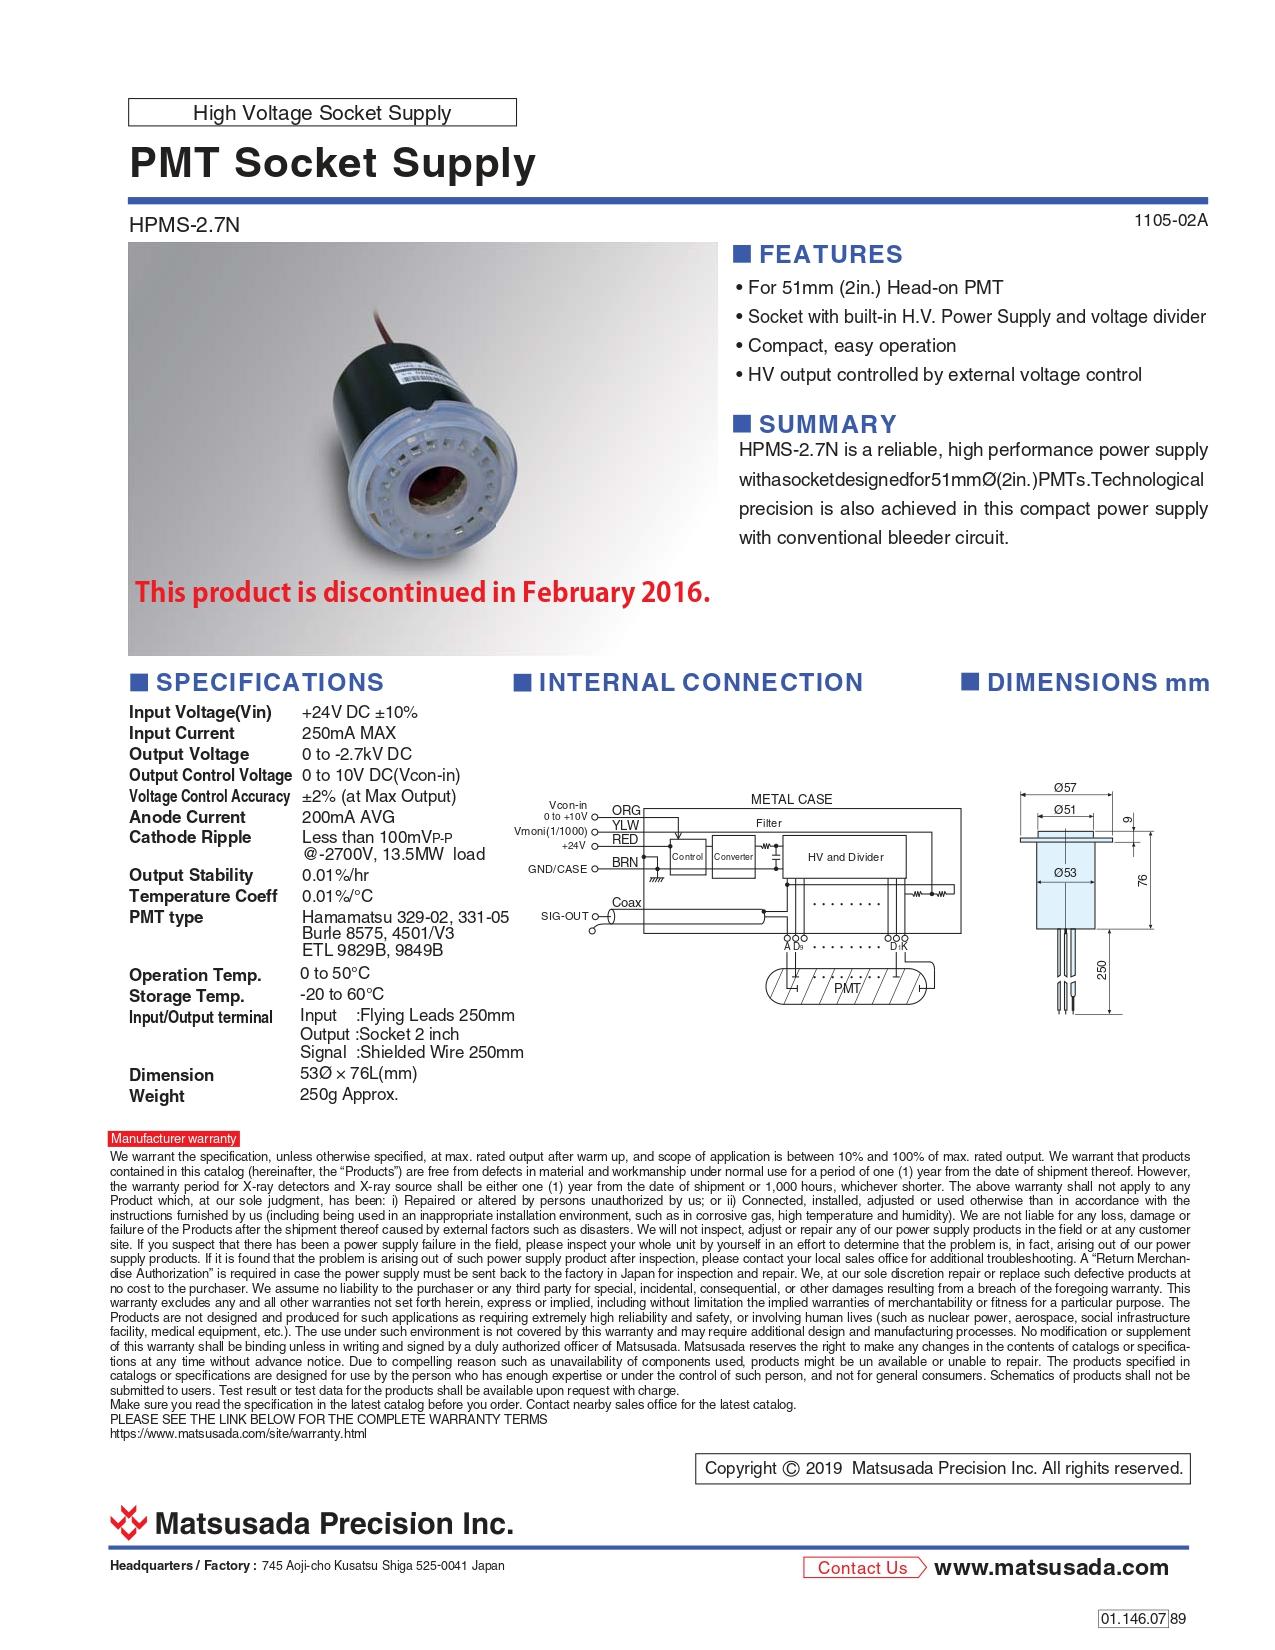 HPMS-2.7N series Datasheet